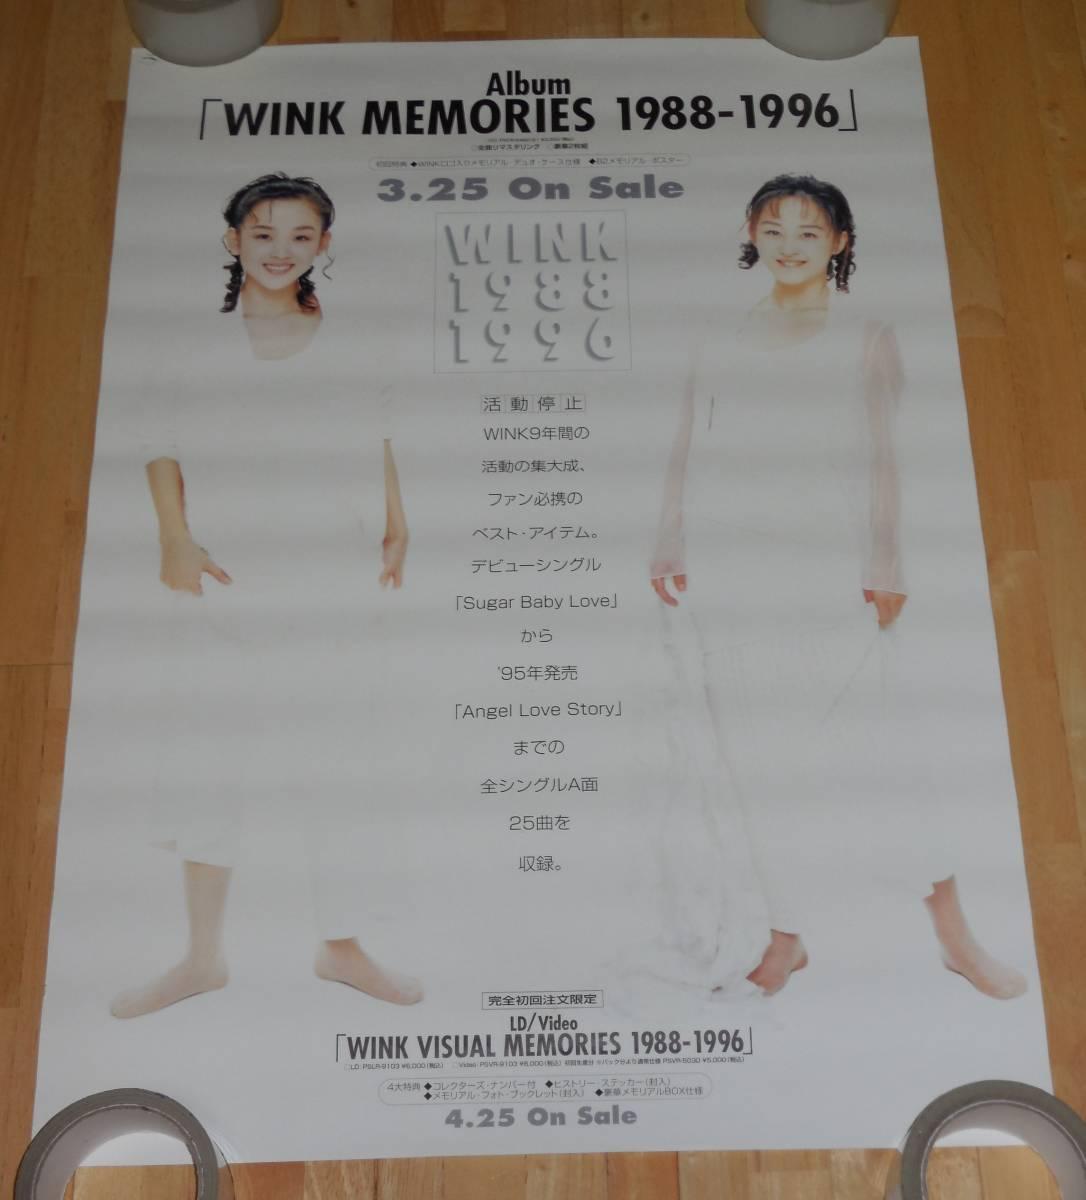 0688/Wink ウインク ポスター/WINK MEMORIES 1988-1996 発売告知/B2サイズ